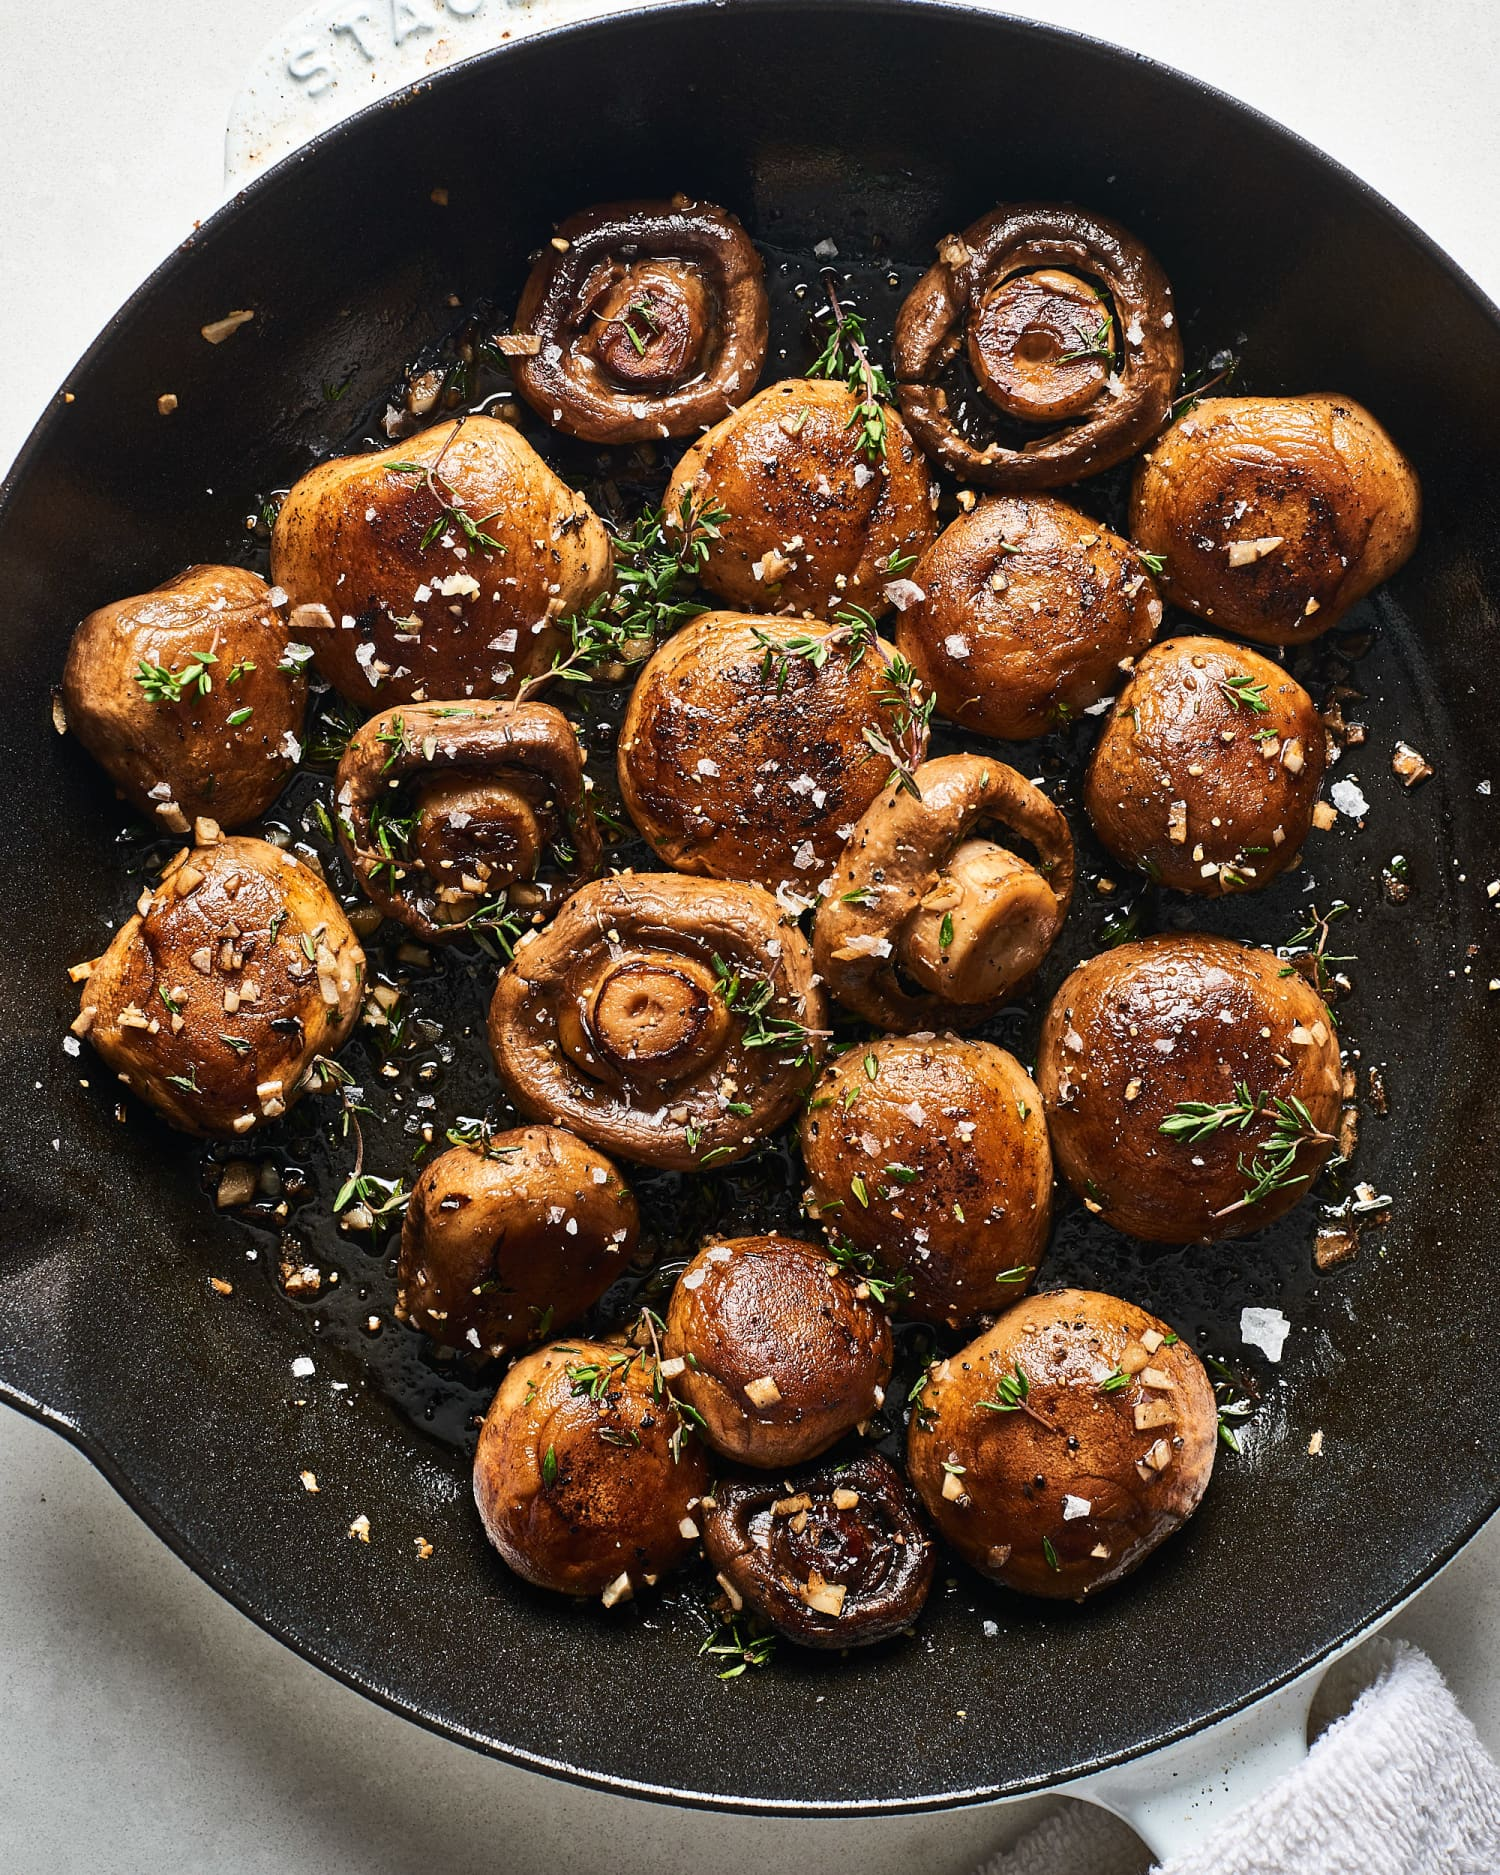 10 Easy Keto Side Dish Recipes